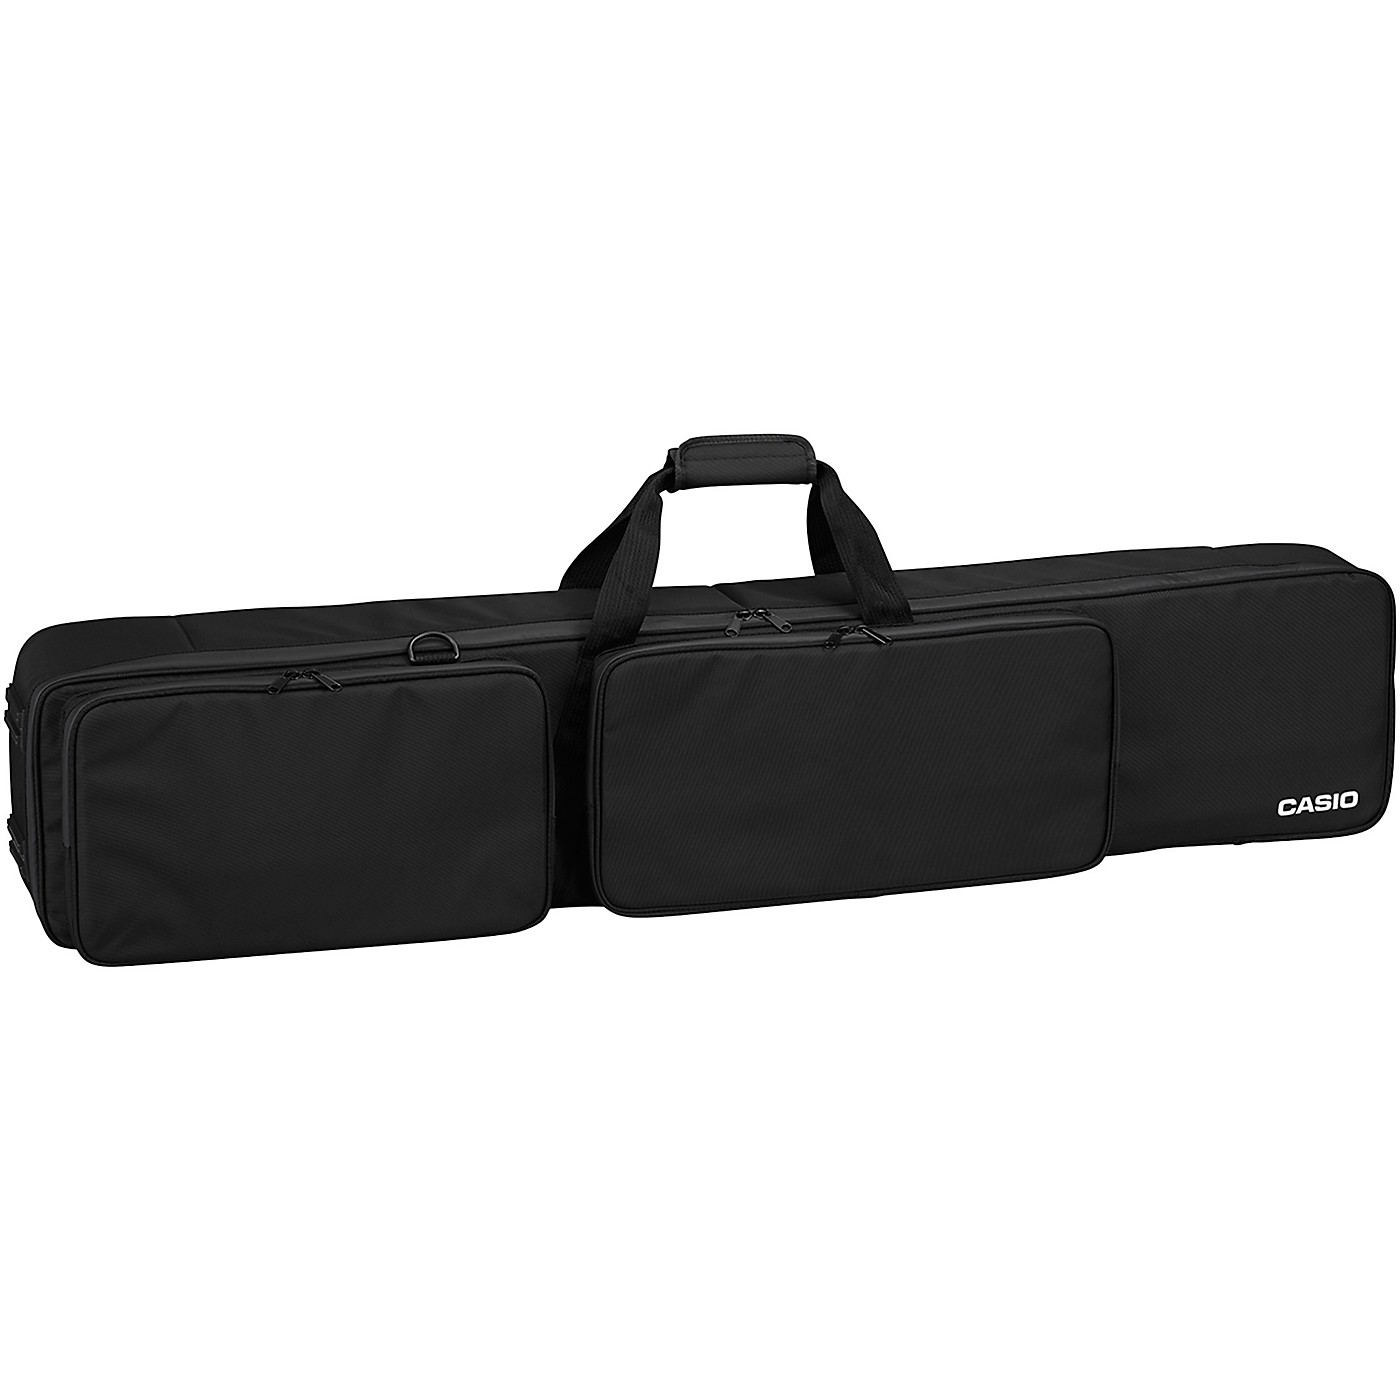 Casio SC-800 Gig Bag thumbnail